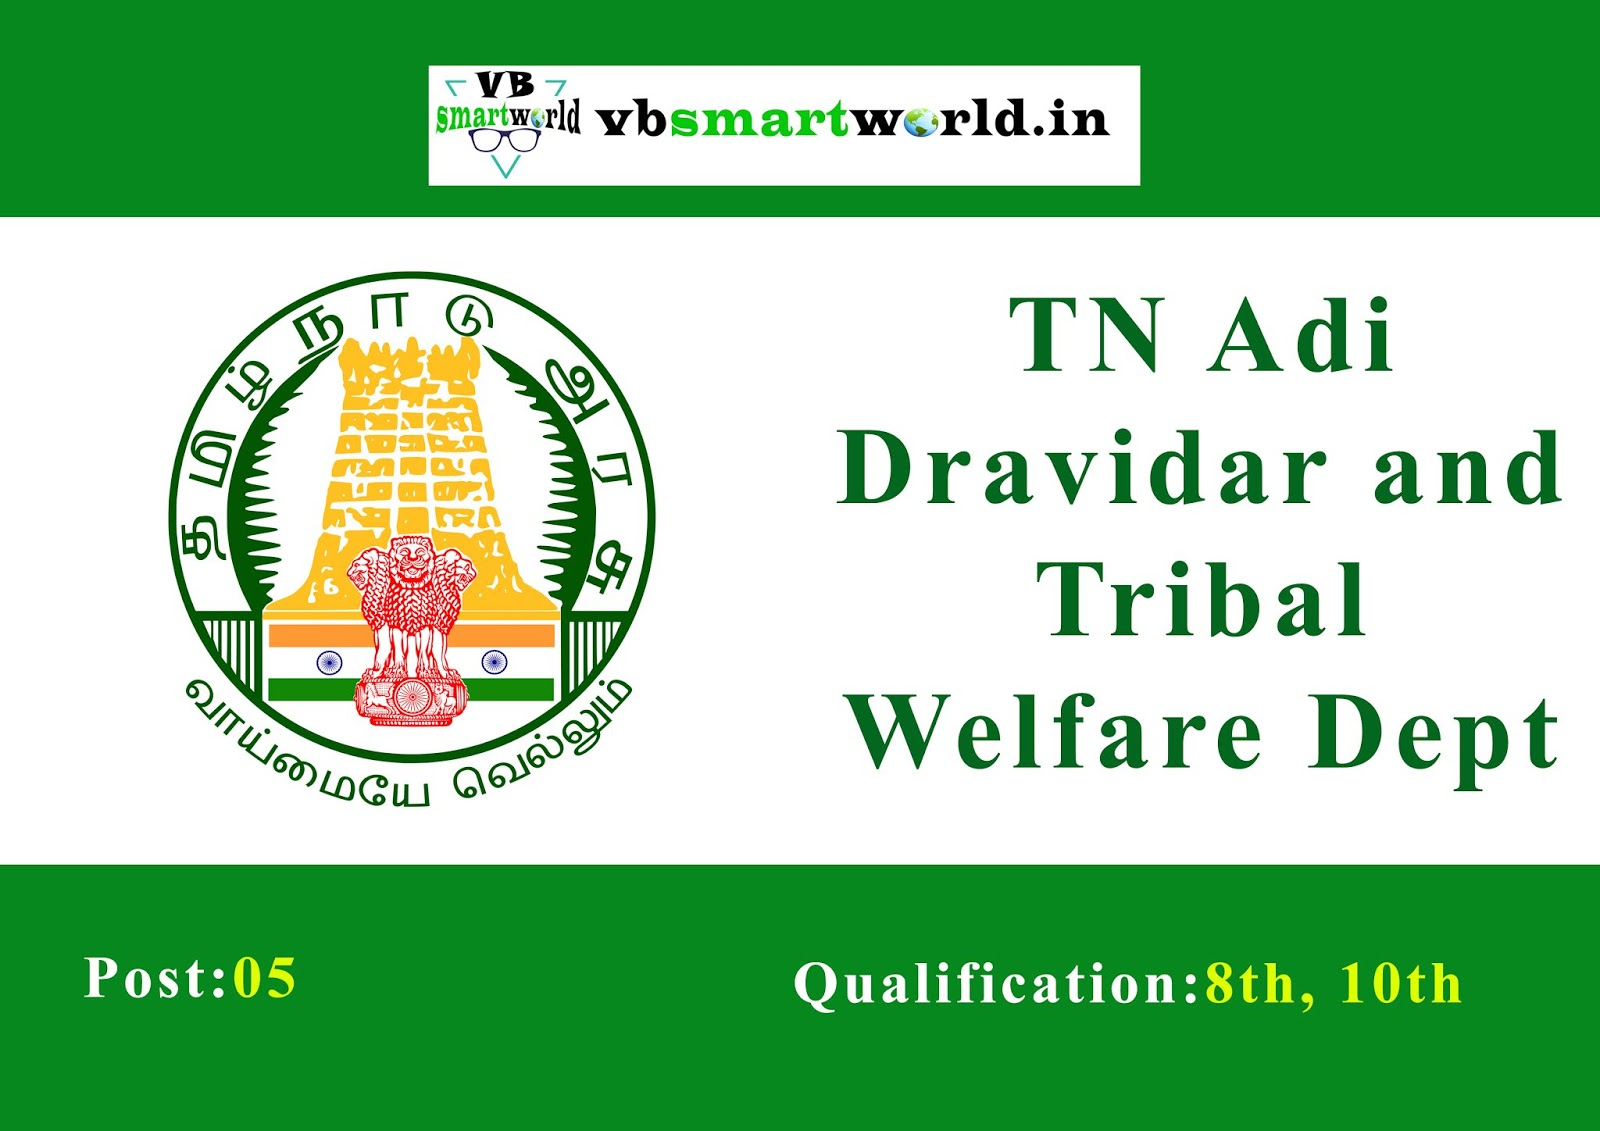 TN Adi Dravidar and Tribal Welfare Dept - vbsmartworld in